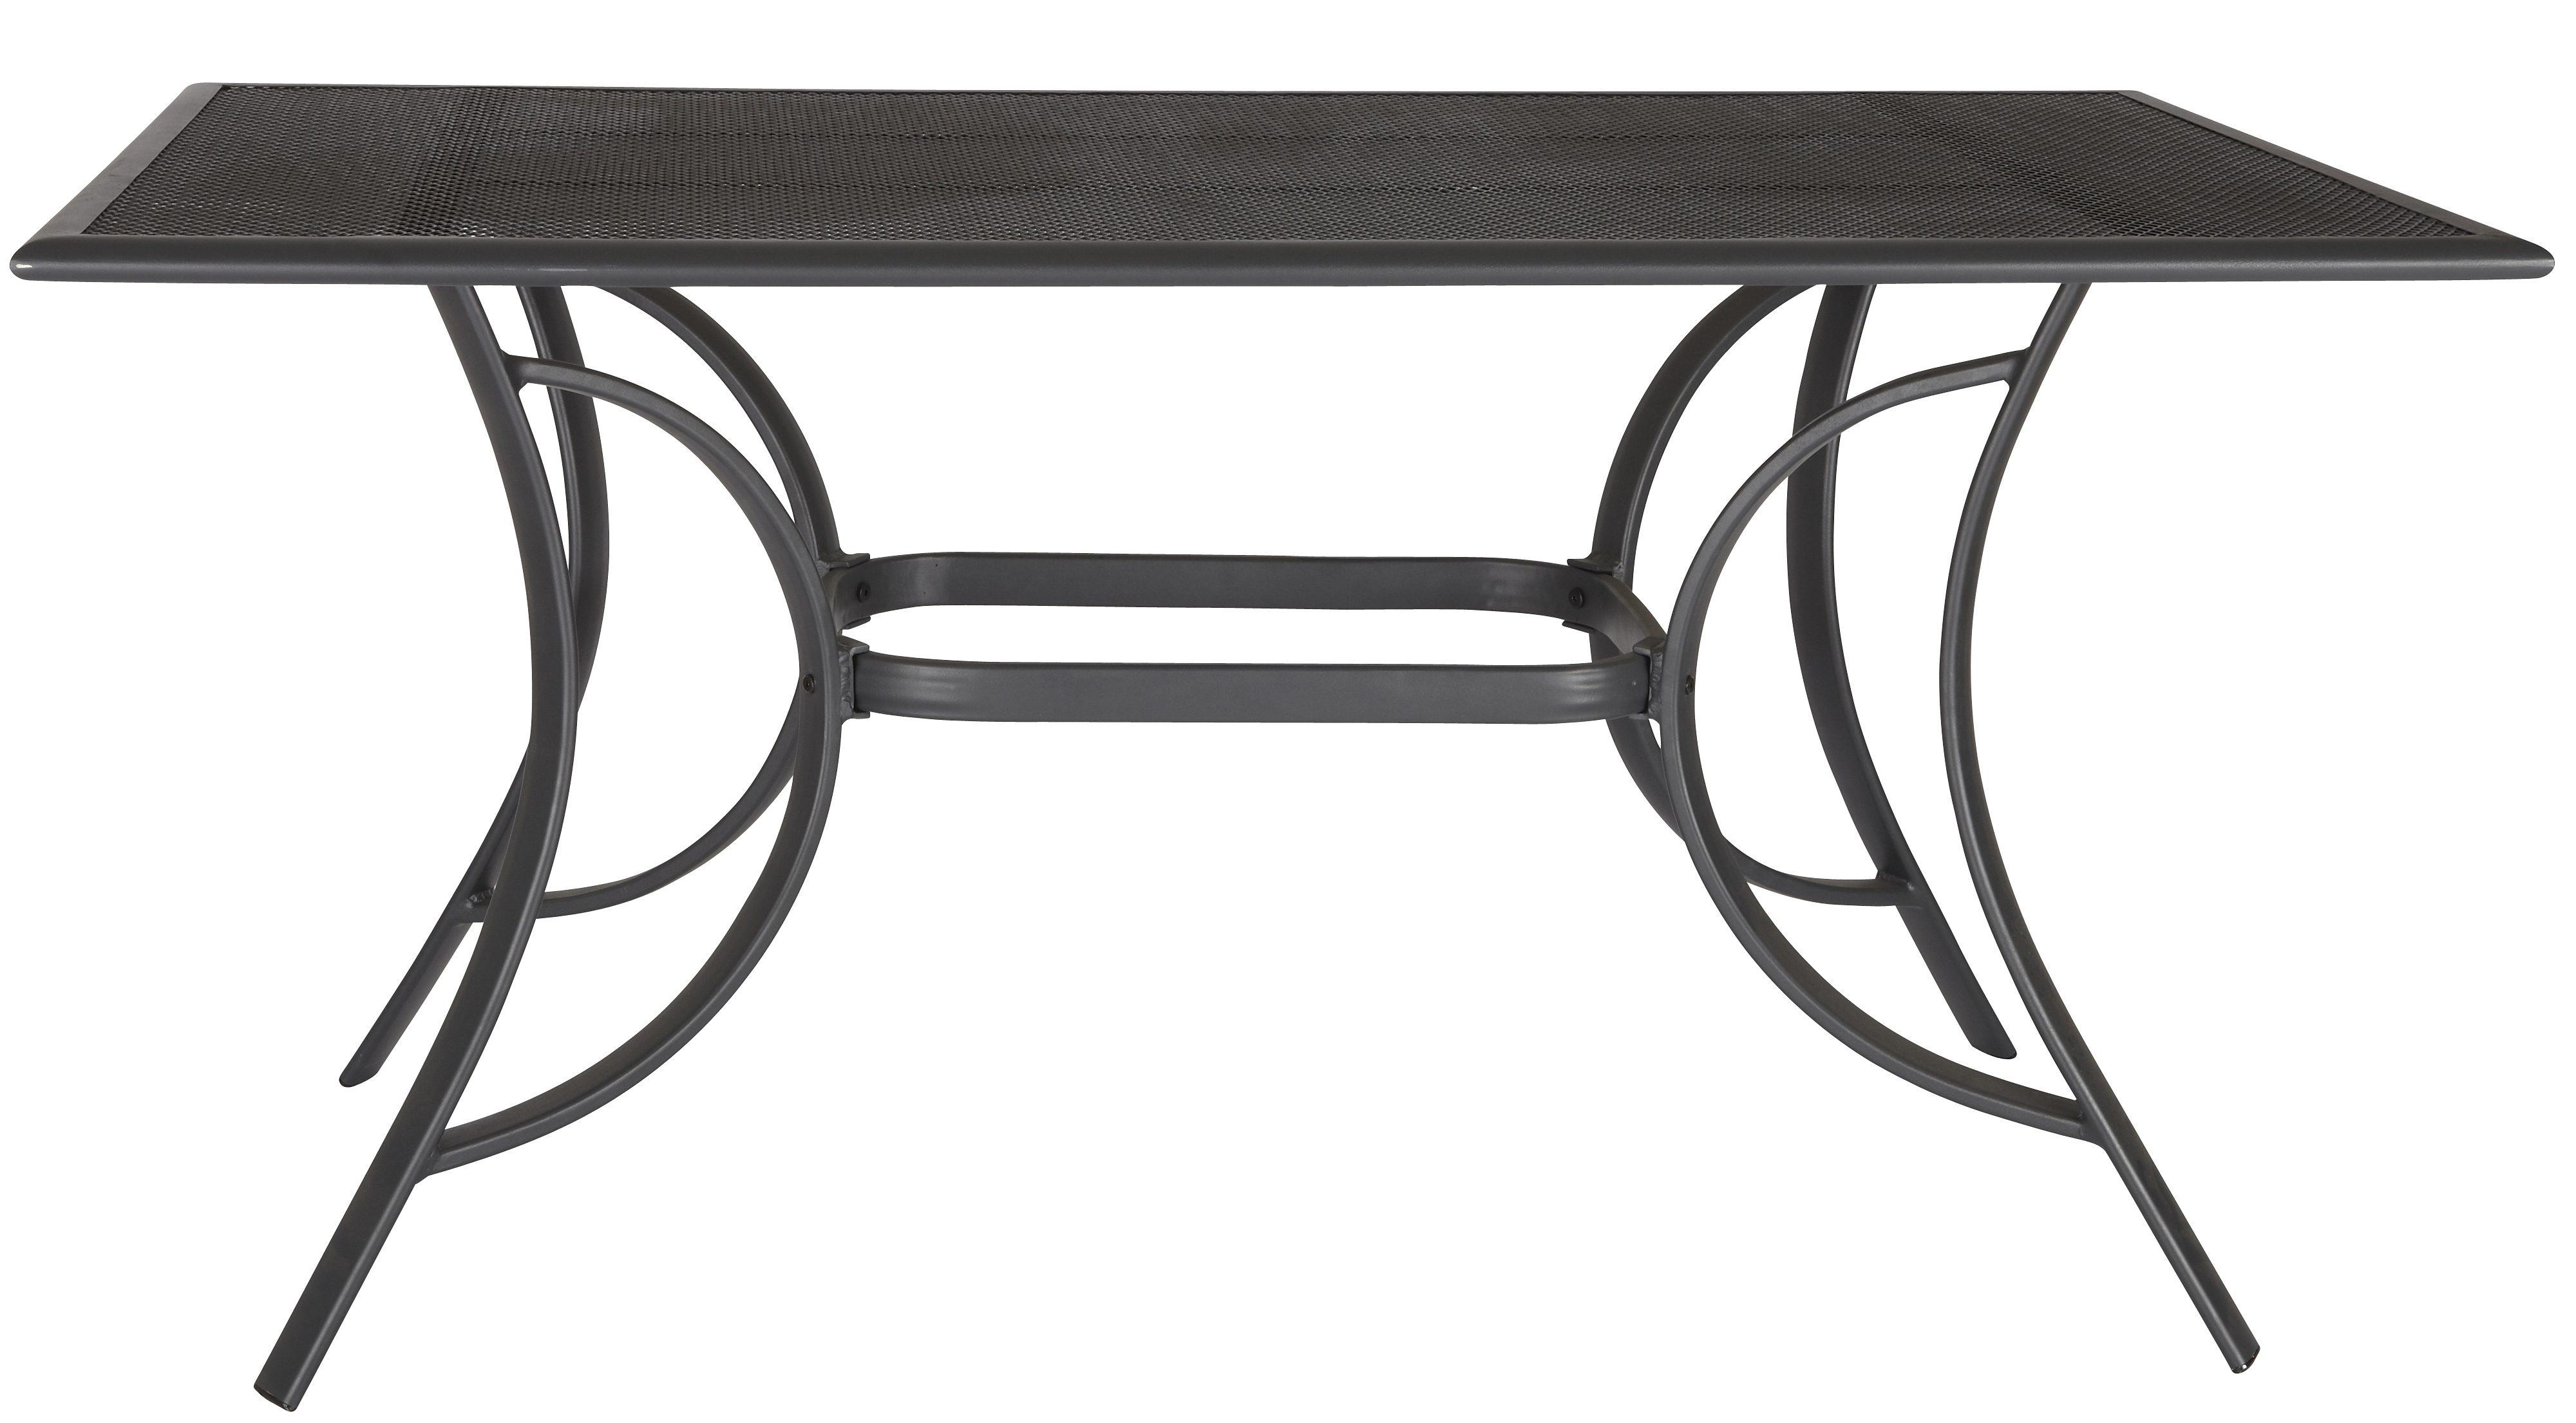 MERXX Gartentisch »Montreal«, Aluminium, 150x90 cm, schwarz